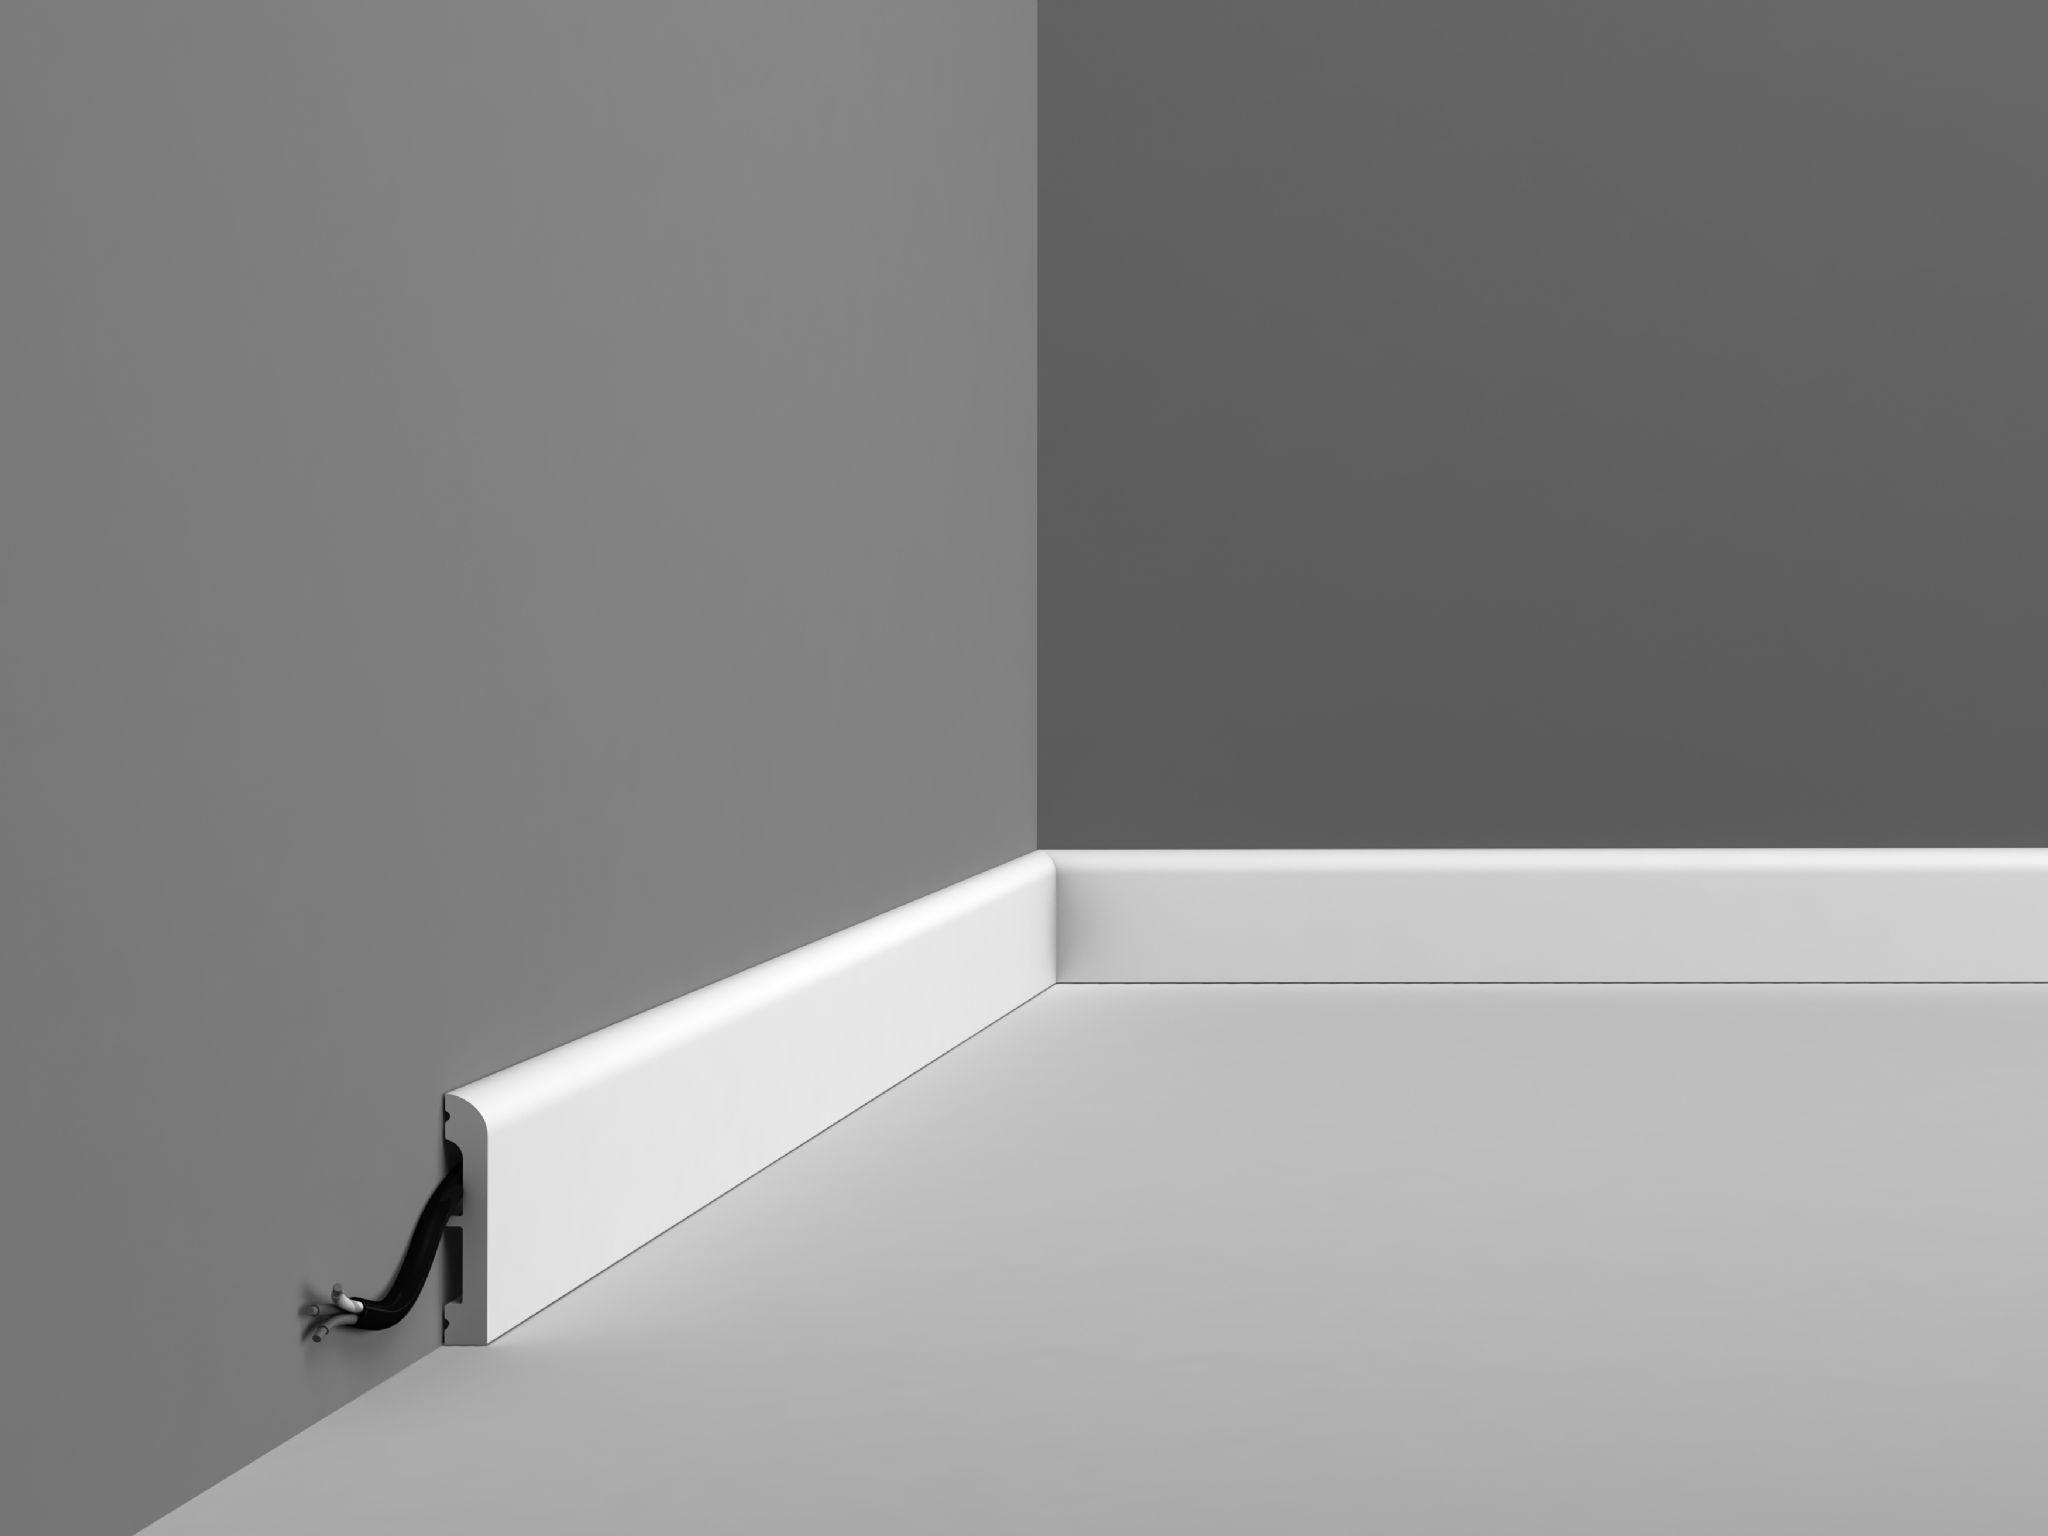 SX183 Plain Contemporary Skirting - Wm Boyle Interior Finishes